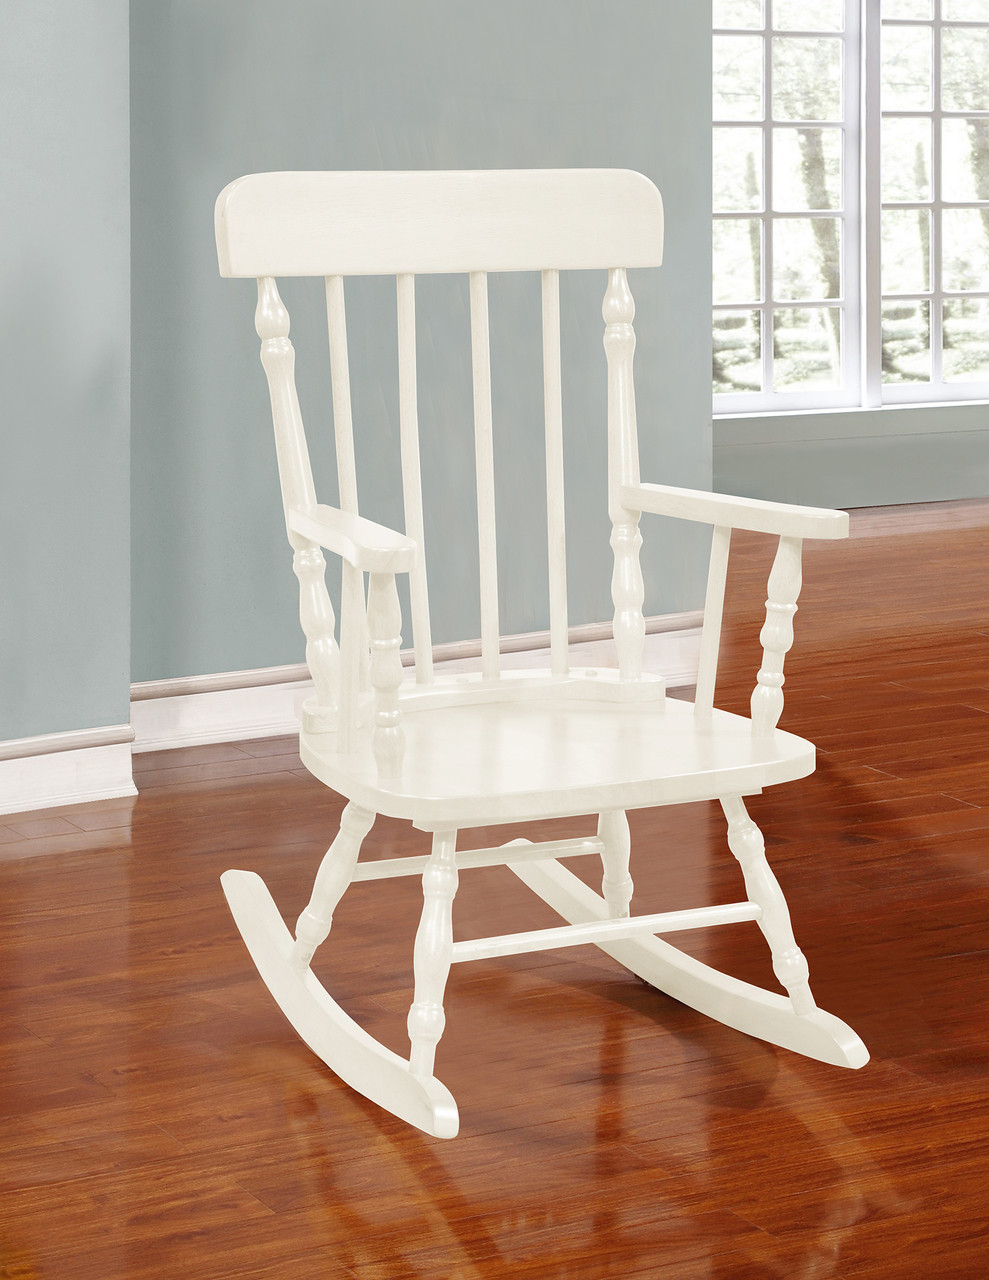 Enjoyable 701075 Kids Solid Wood Rocking Chair Bella Esprit Unemploymentrelief Wooden Chair Designs For Living Room Unemploymentrelieforg